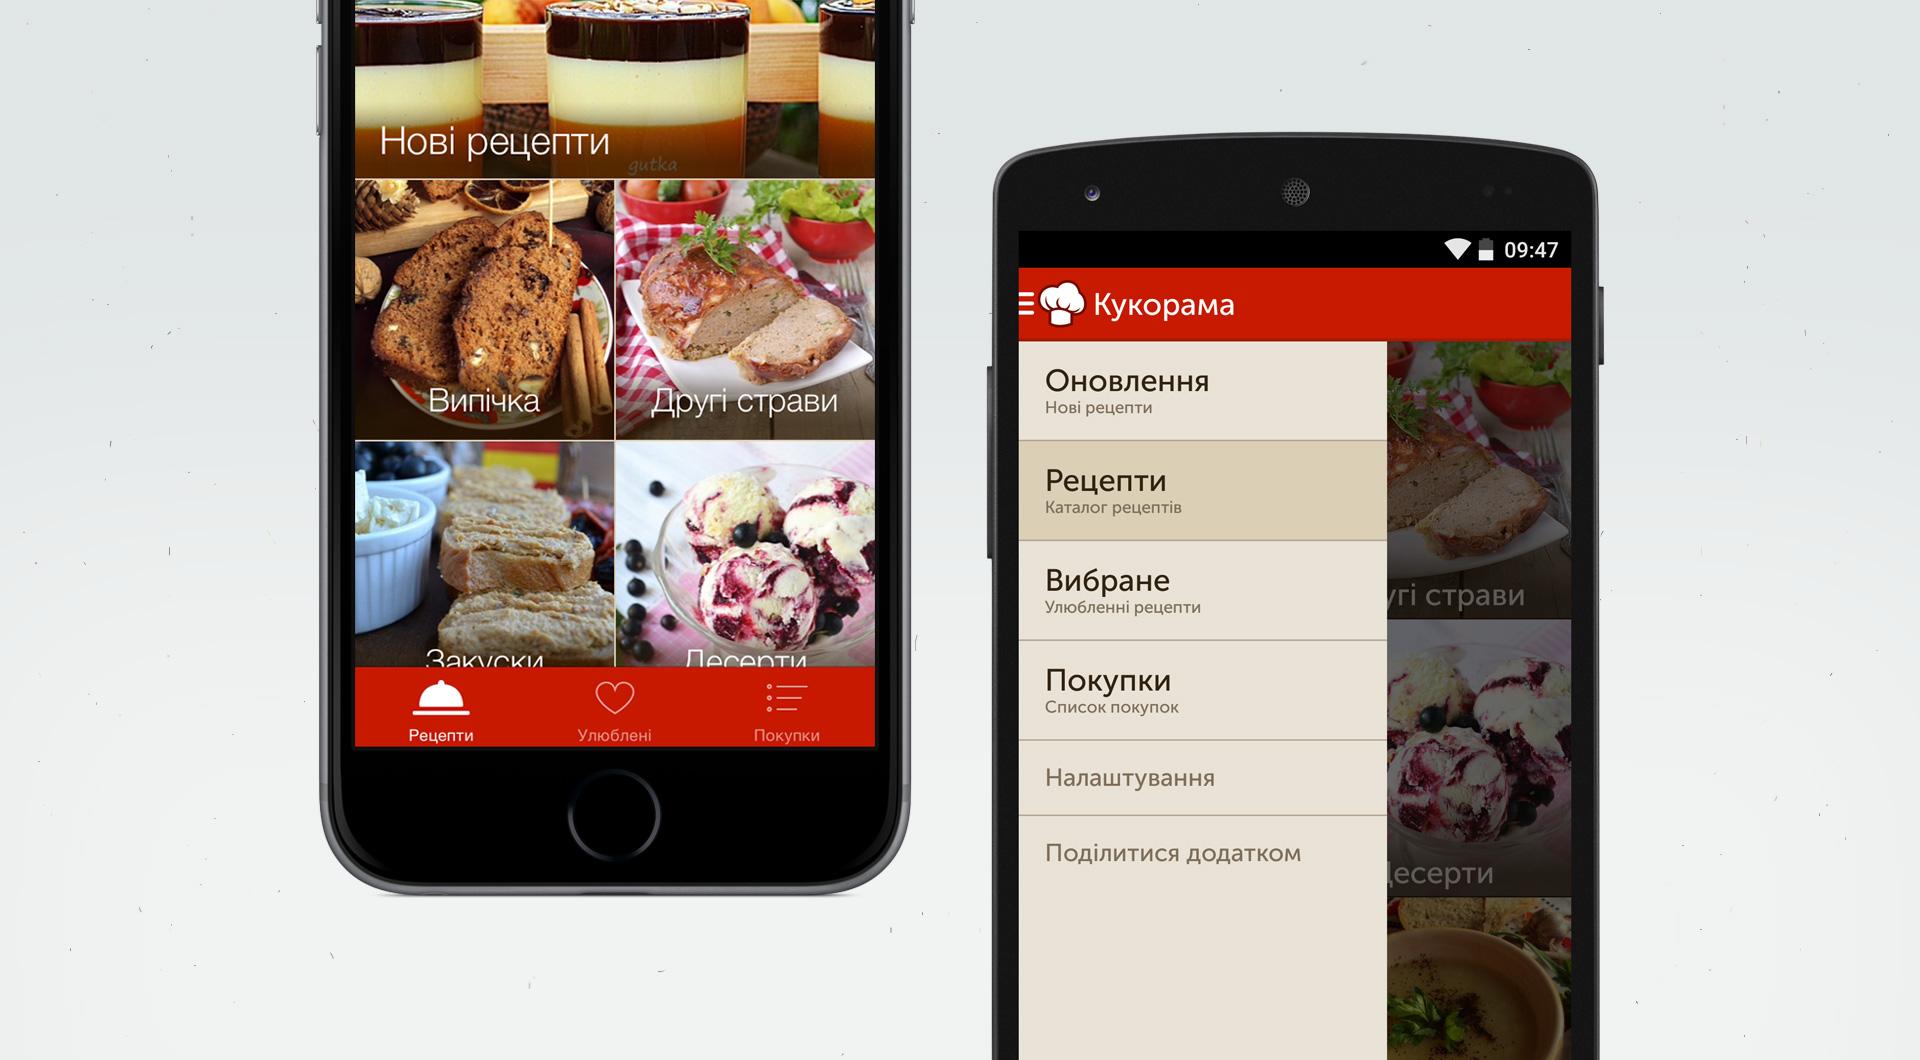 Navigation in Cookorama app